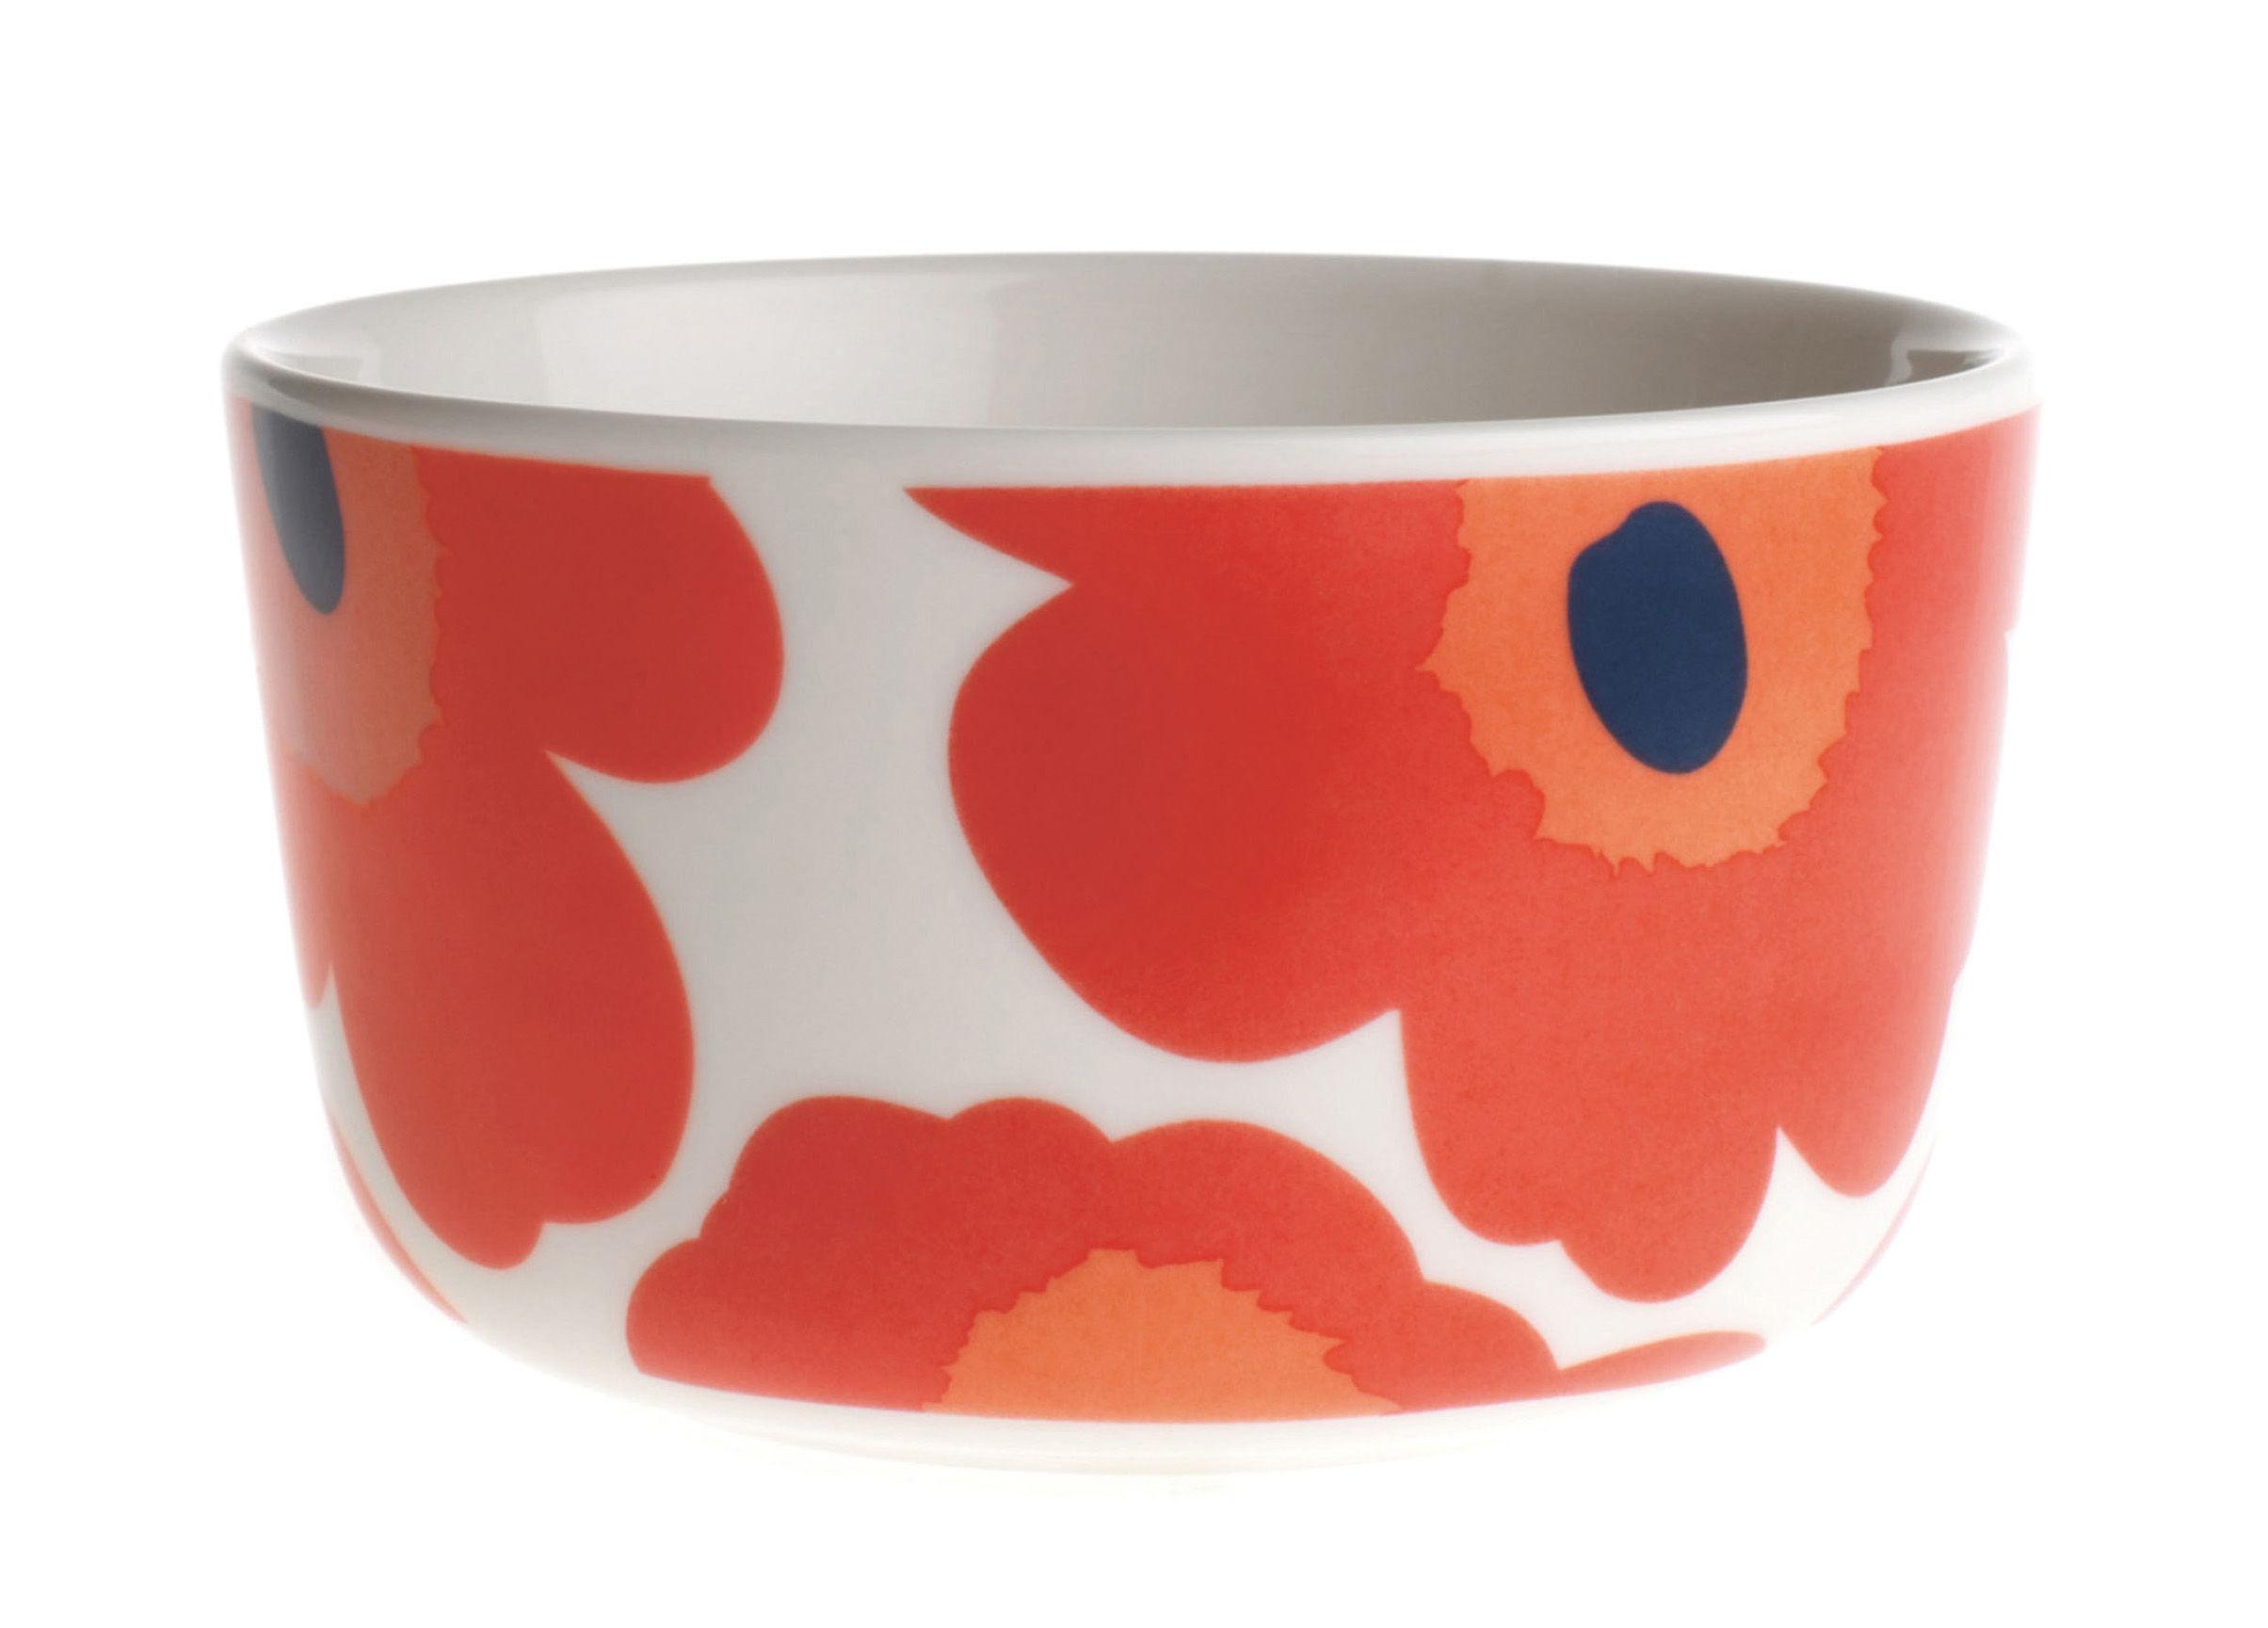 Tableware - Bowls - Unikko Bowl - Ø 9 cm by Marimekko - Ø 9 cm - Unikko - White & red - Enamelled china